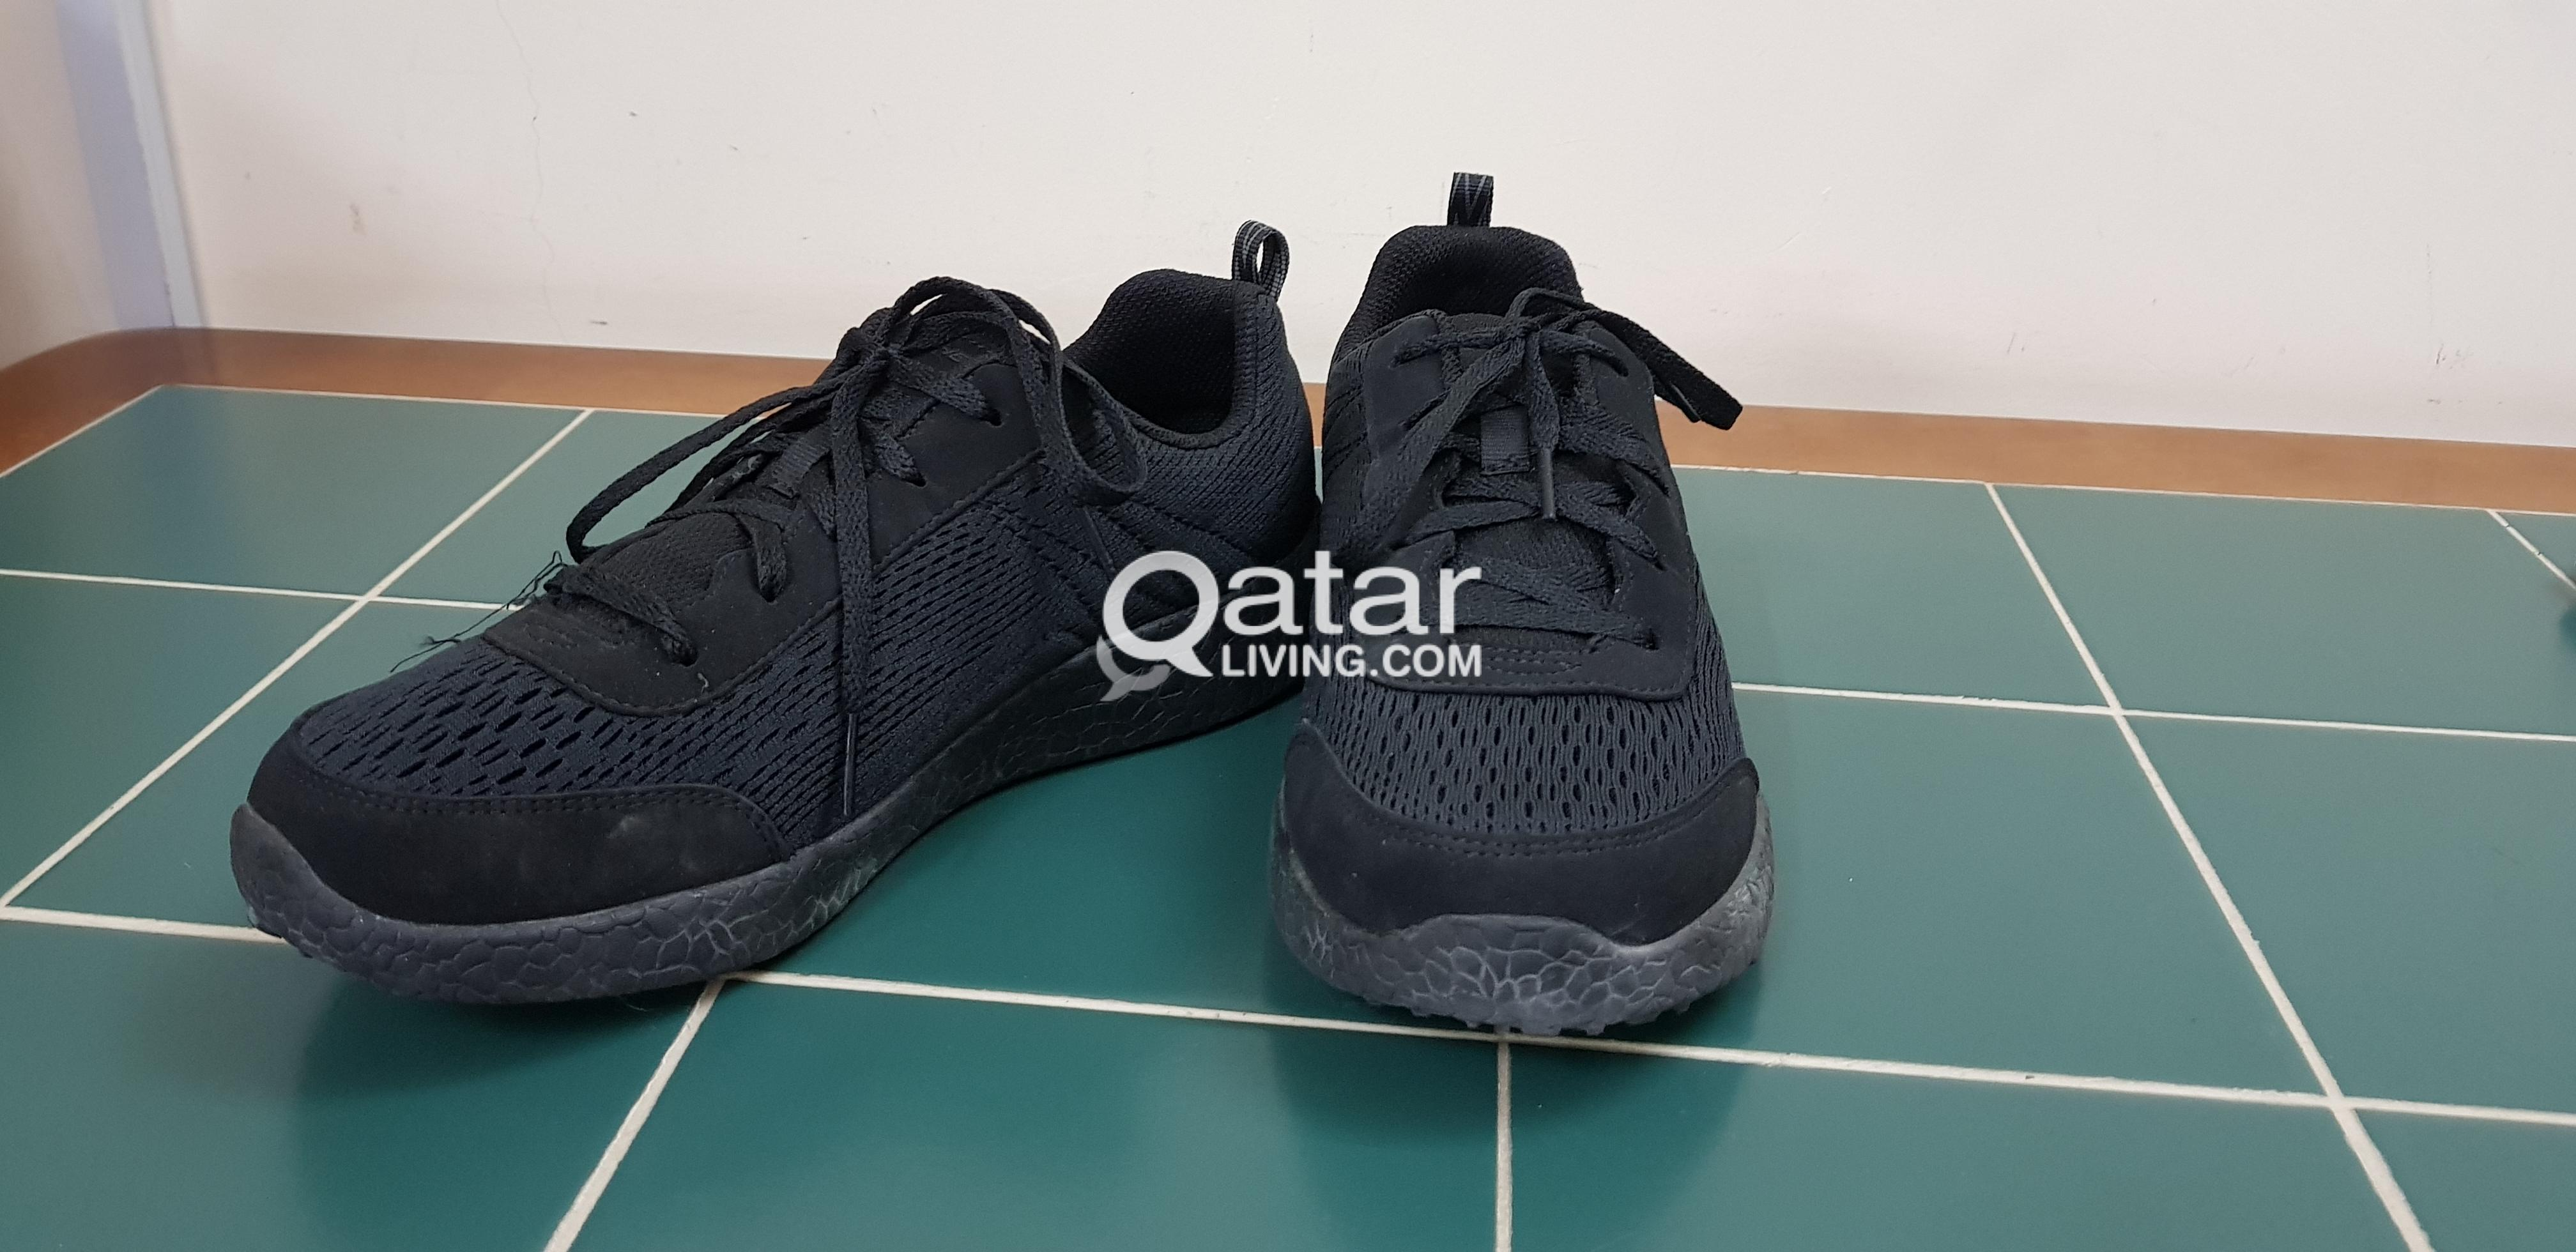 skechers shoes made in vietnam